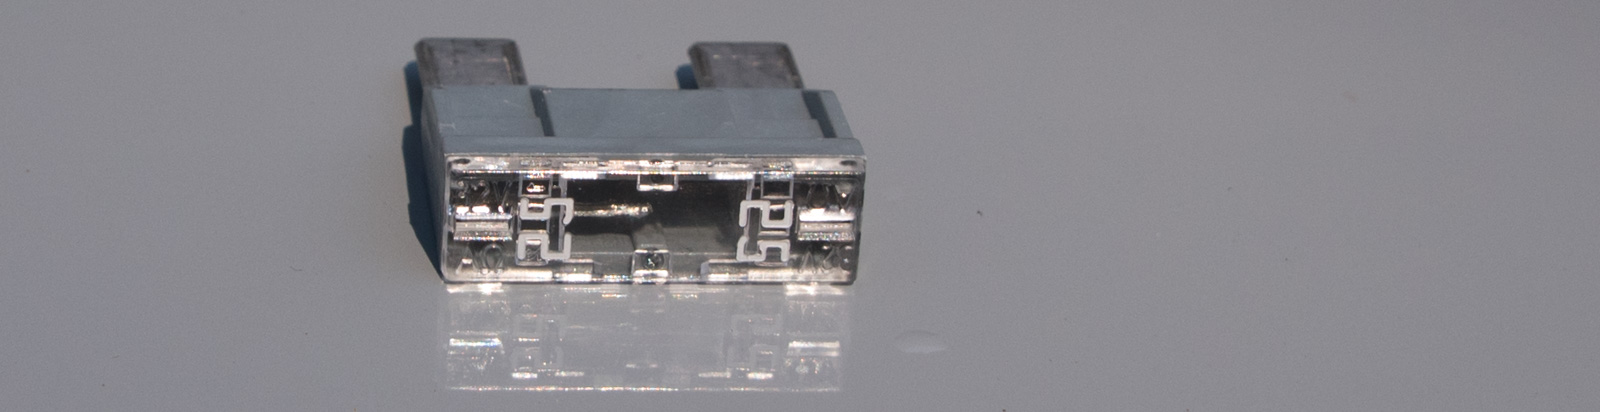 Blue Sea Systems 500 Amp ANL Fuse 5137